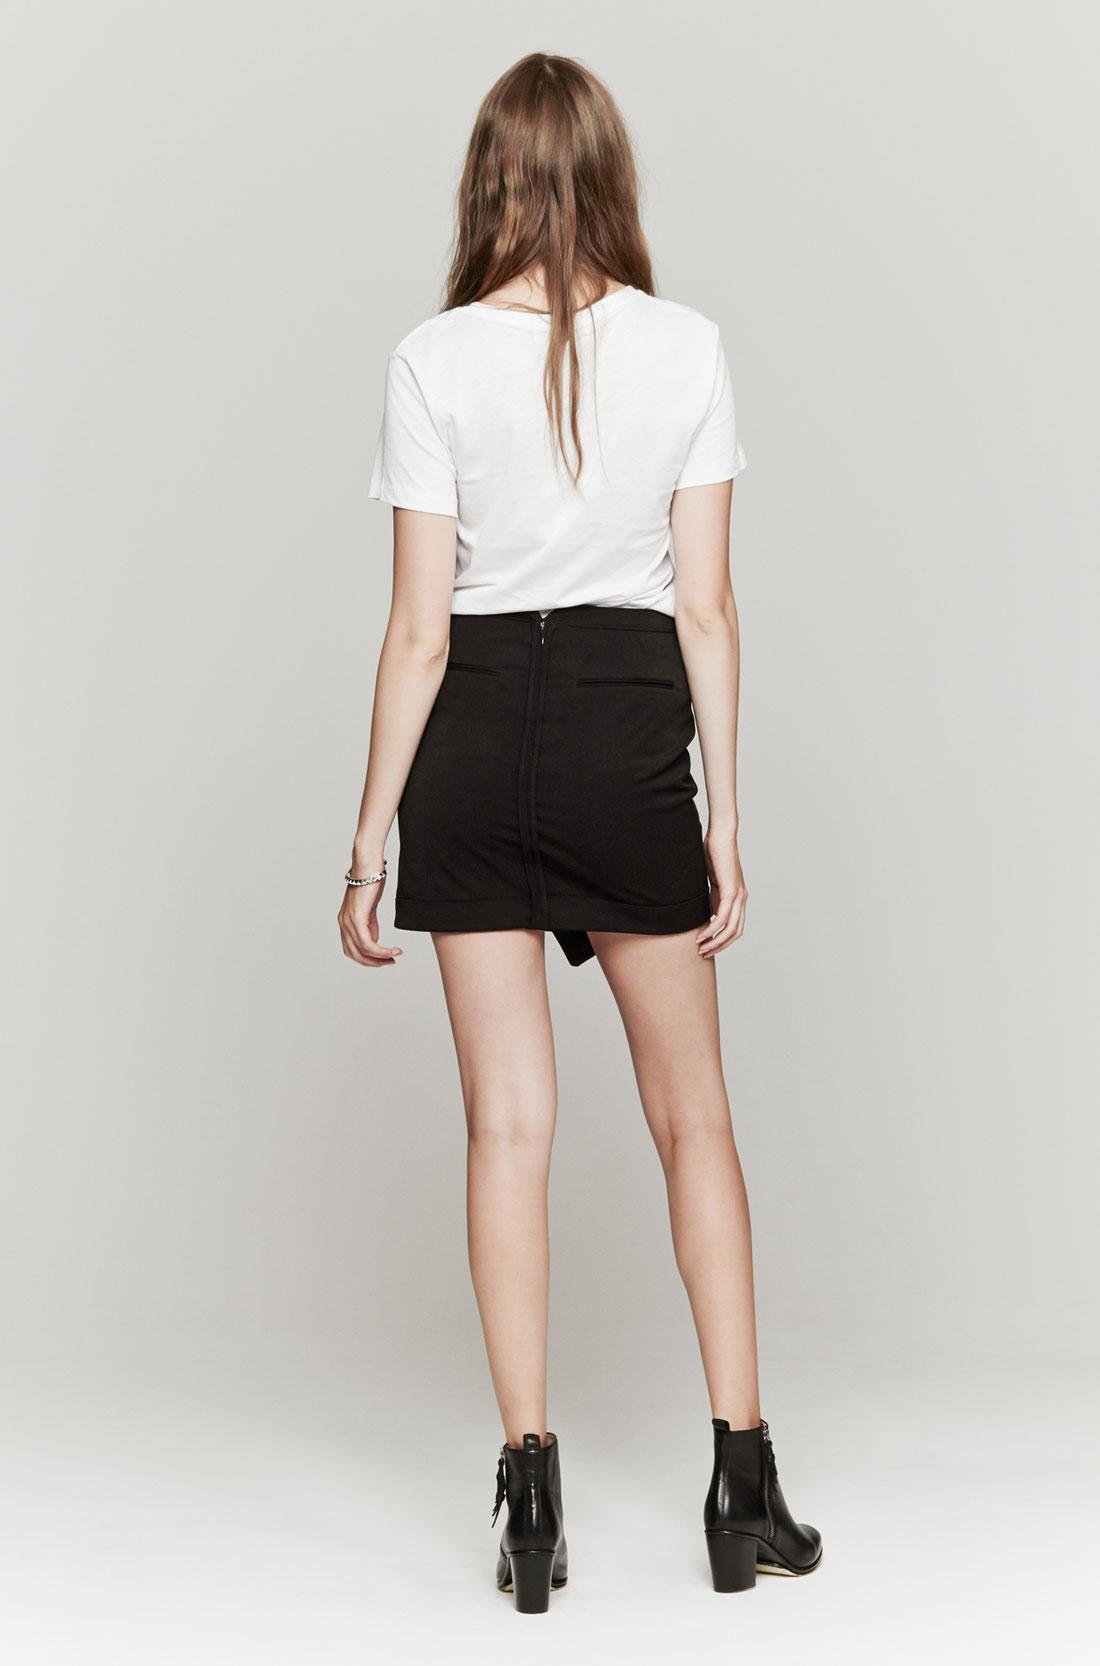 black leather wrap skirt dress ala